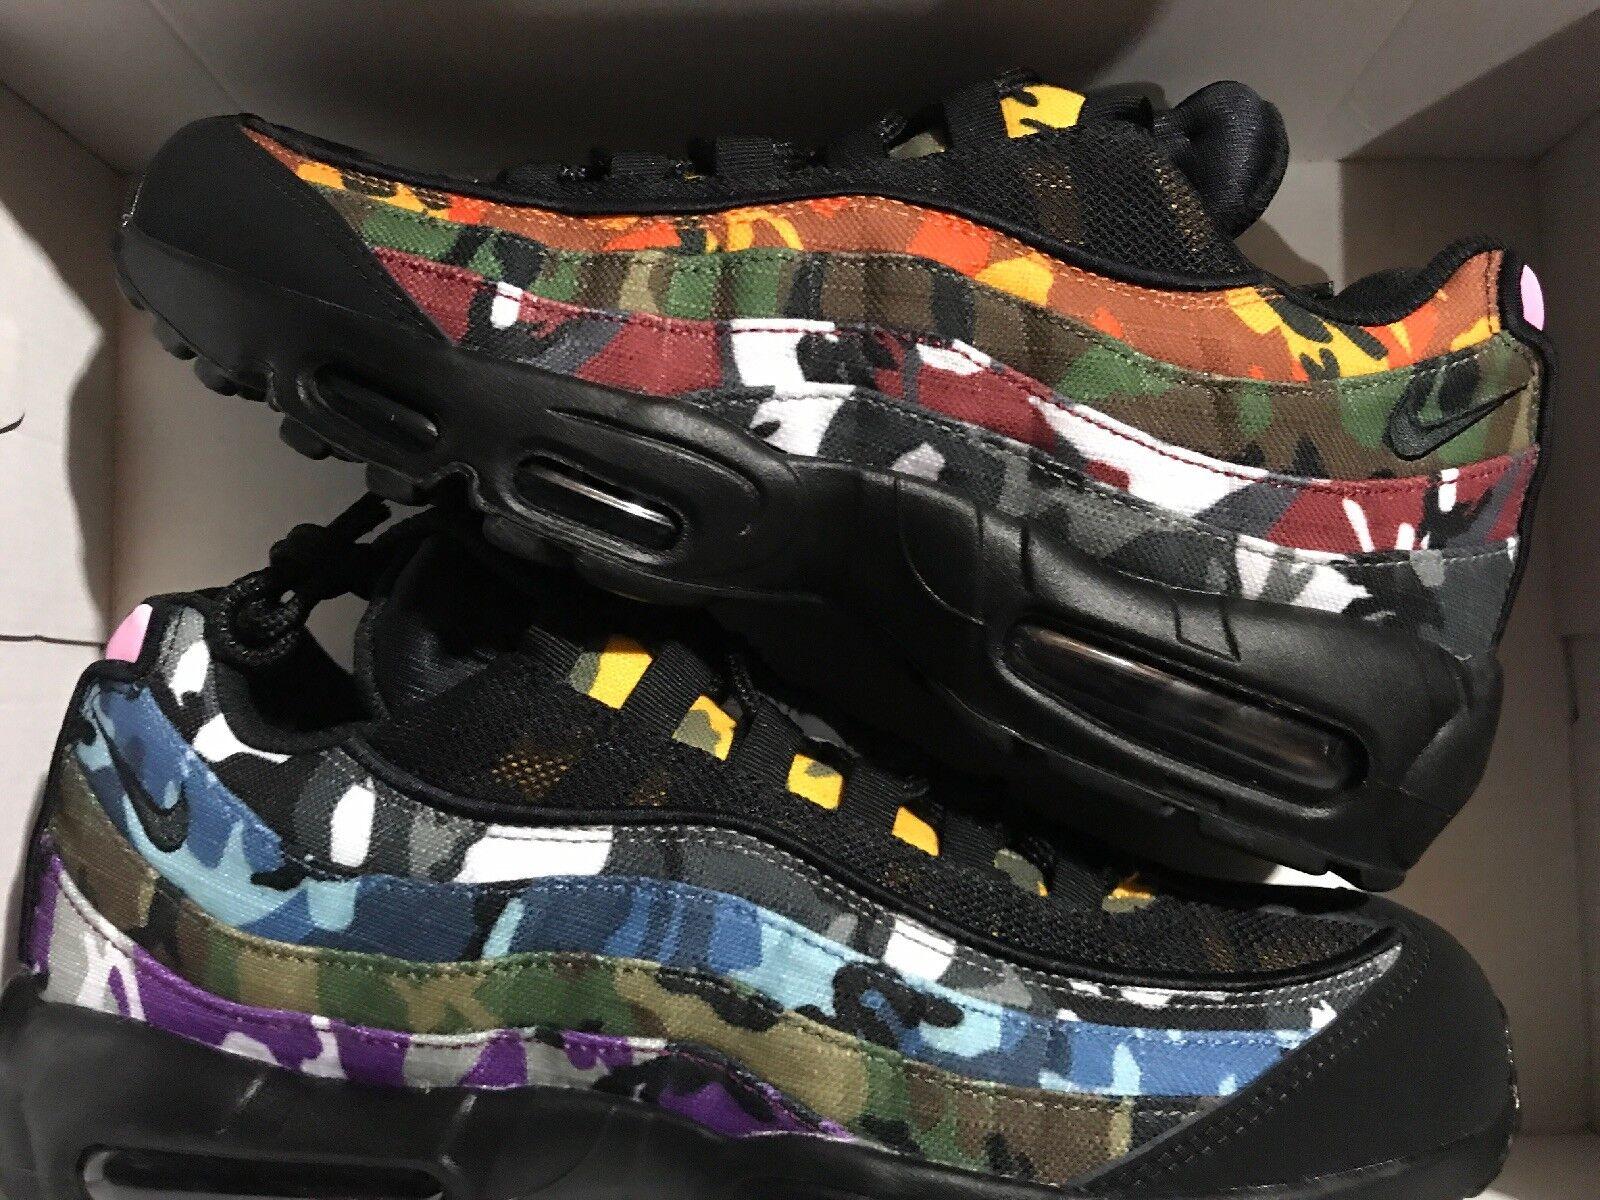 Nike air max - 95 erdl partei 13 multi - max farbe camo, was die ar4473-001 neue 073ce4